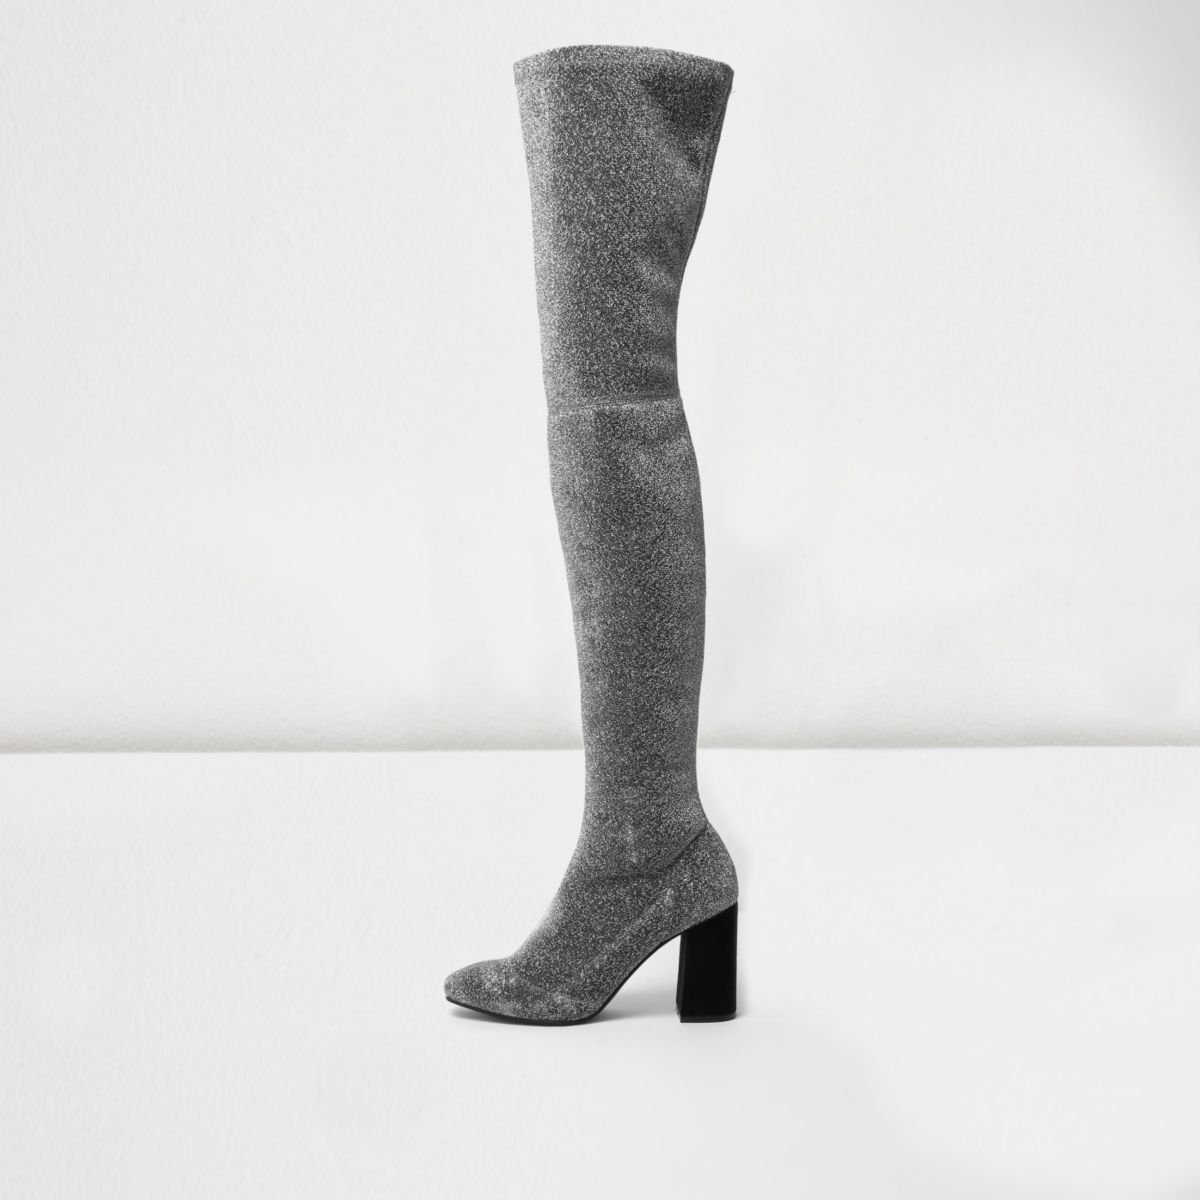 af49336bf3ac87 Glitzernde Overknee-Stretch-Stiefel in Silber - Stiefel - Schuhe ...